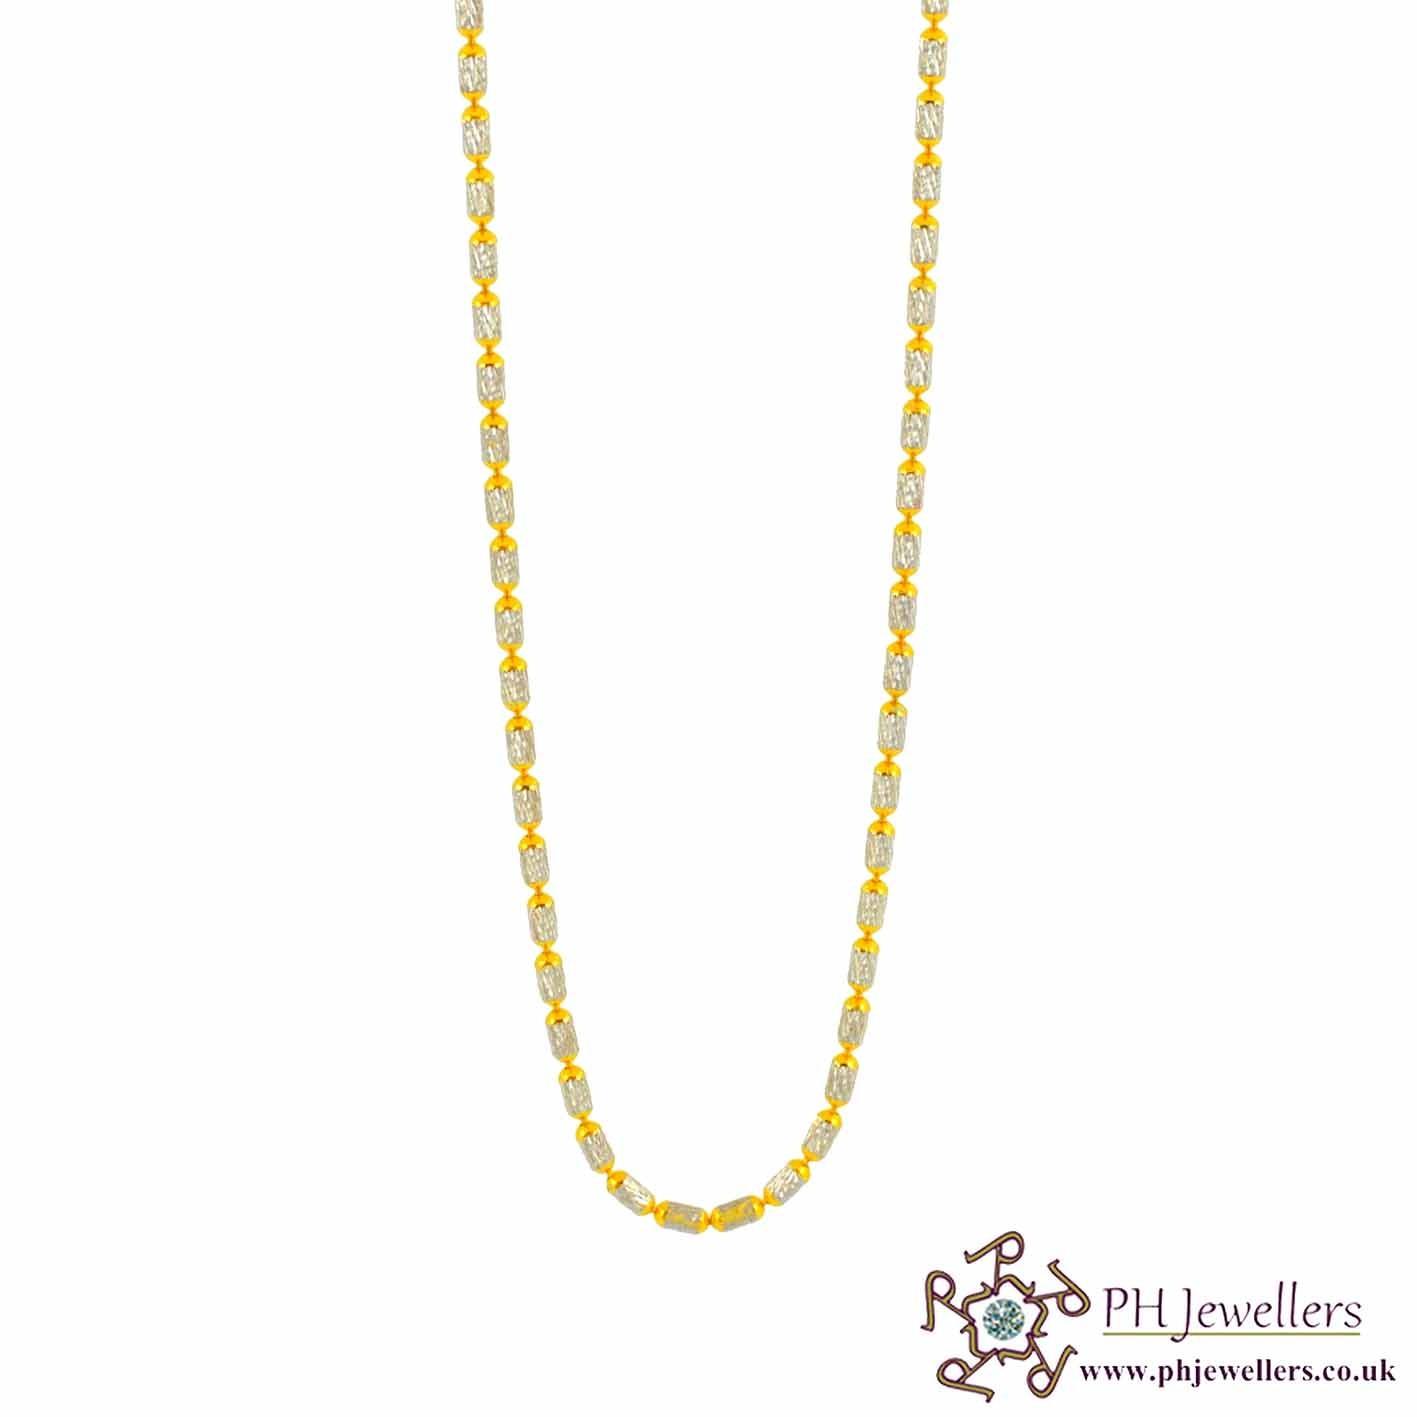 22CT 916 Hallmark Yellow Gold Bead Rhodium Chain RC26